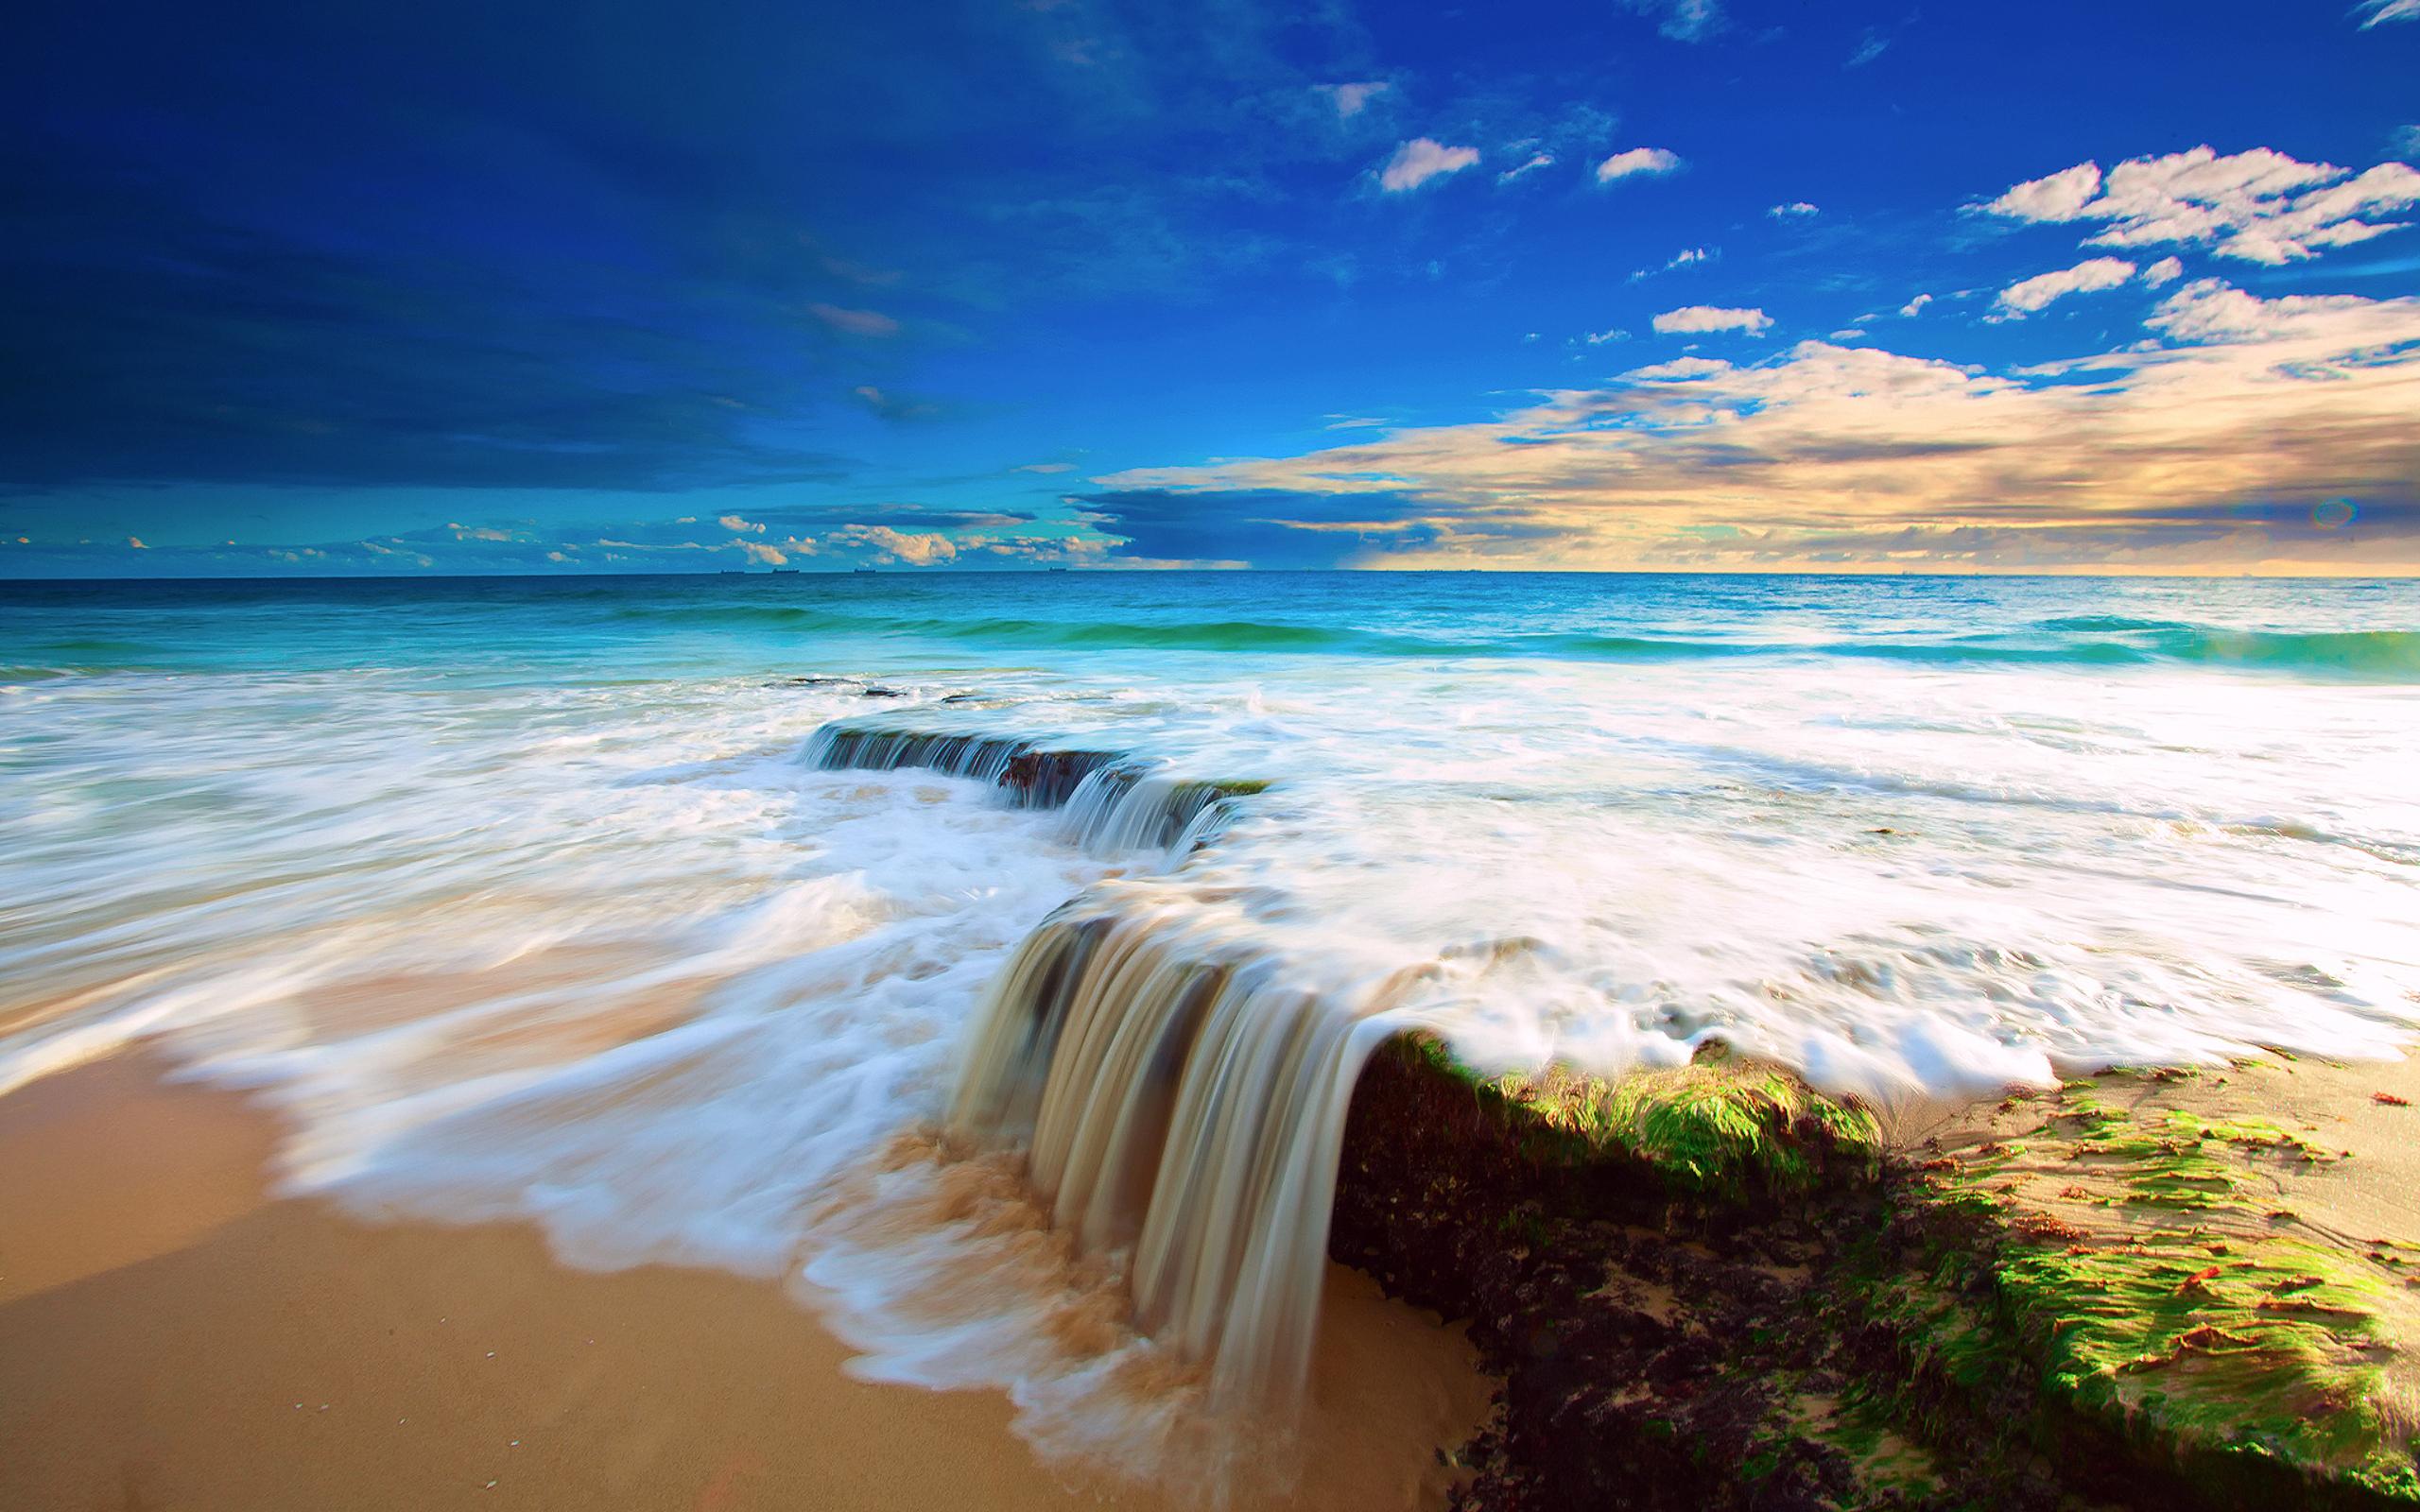 ... the ocean wallpapers category of free hd wallpapers ocean scenes is